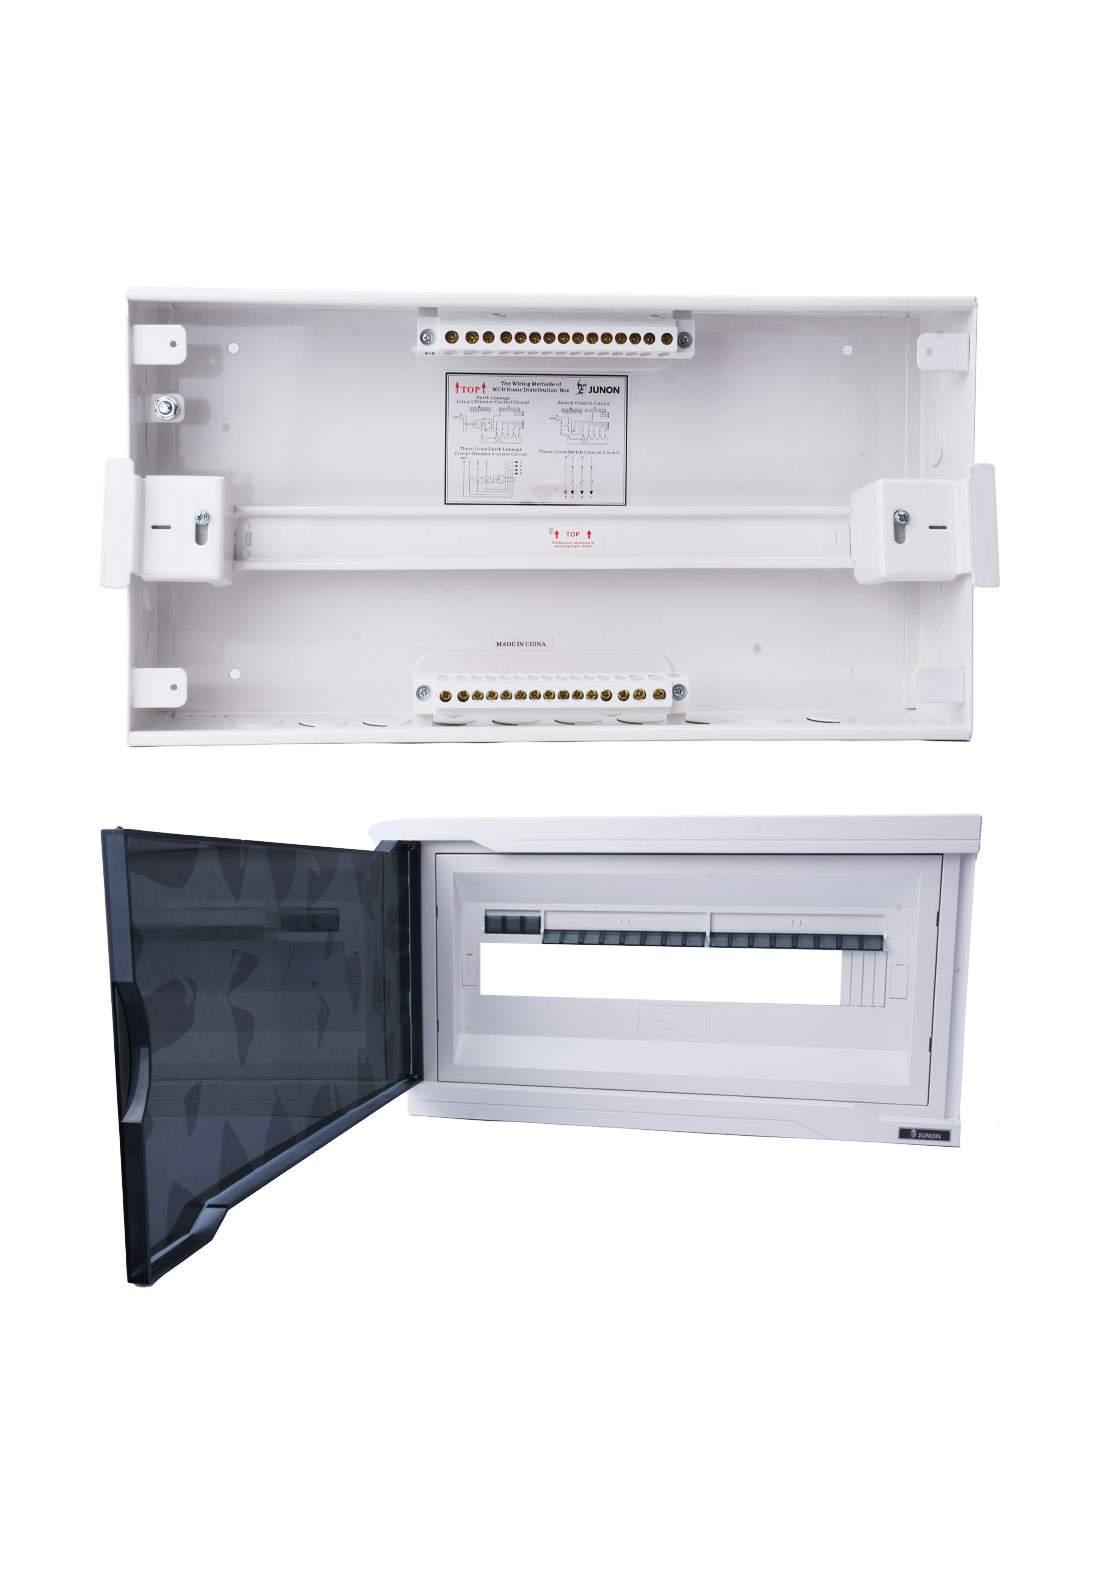 Junon DX18-A19TWB Power Distribution Box 19 Ways بوكس توزيع الكهرباء